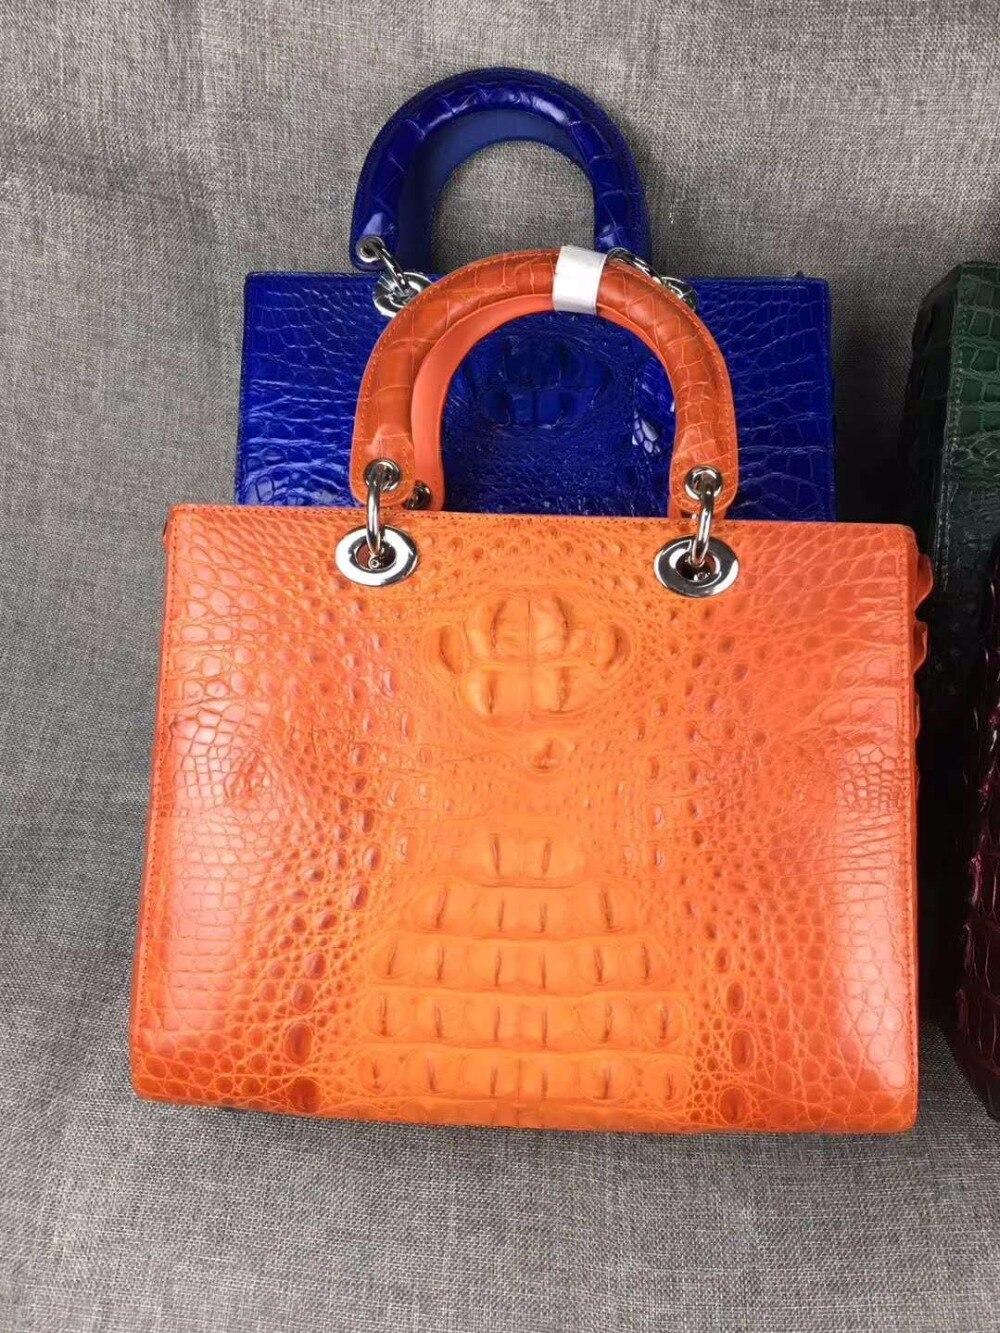 2018 newest high end quality 100% real genuine crocodile skin women tote handbag shouder orange color crocodile head skin flat 2018 yuanyu new hot free shipping real crocodile women handbag crocodile handbag lady high end hand women bag